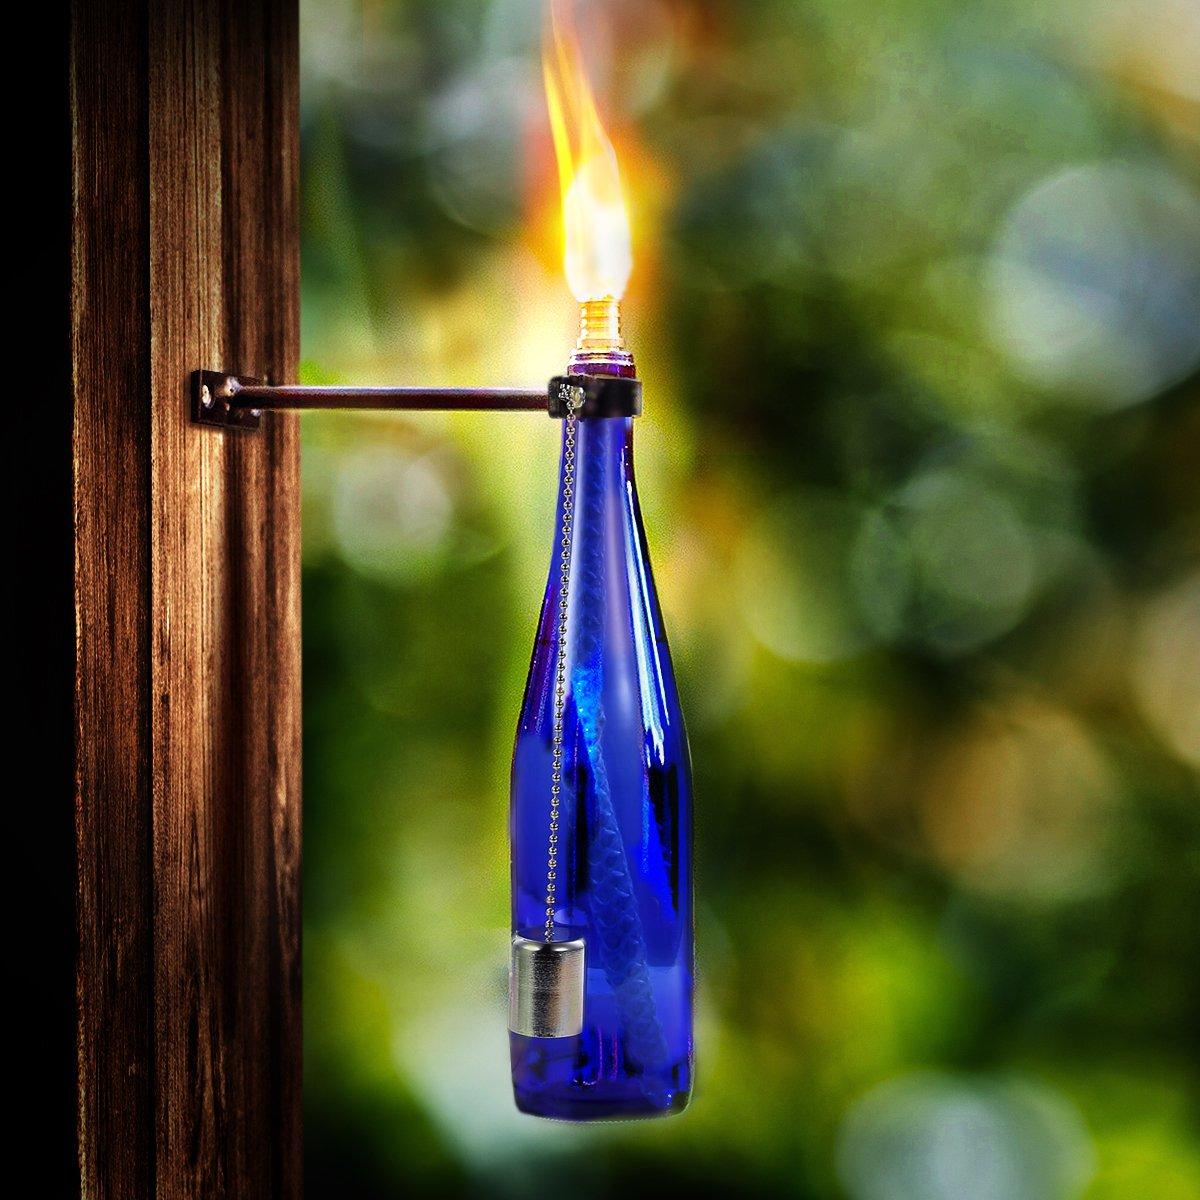 Lanmu Wine Bottle Wick Torch Kit Citronella Torch Oil Lamps